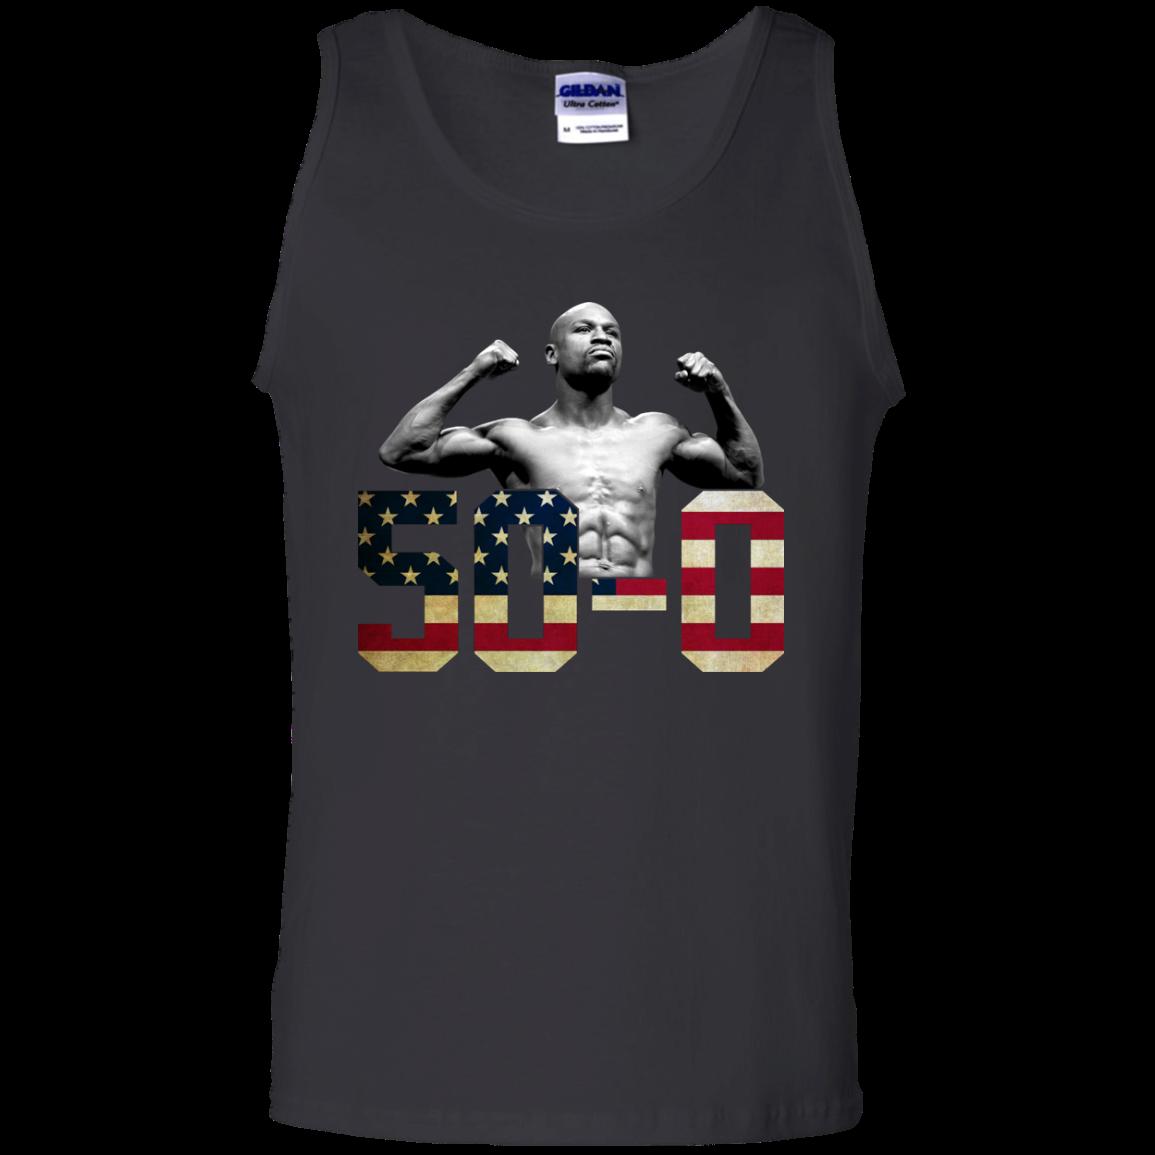 image 509px Floyd Mayweather 50 0 Shirt, Hoodies, Tank